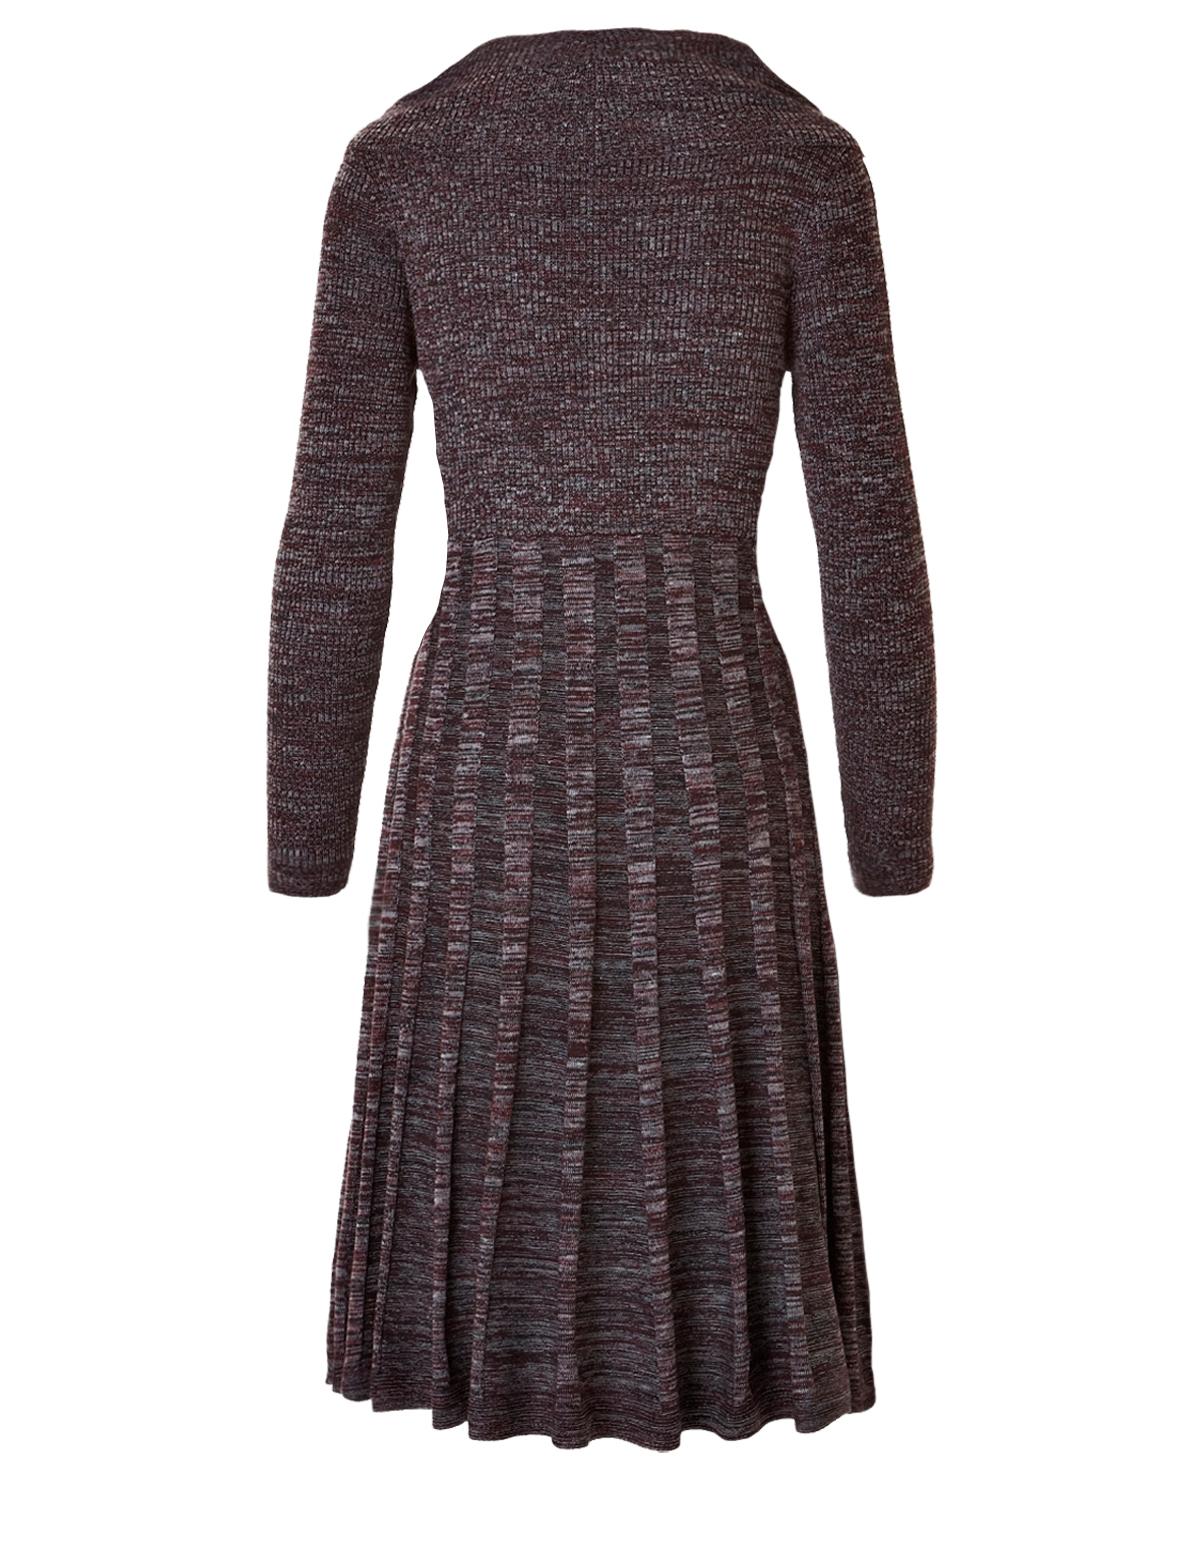 Garnet Cowl Neck Sweater Dress | Cleo